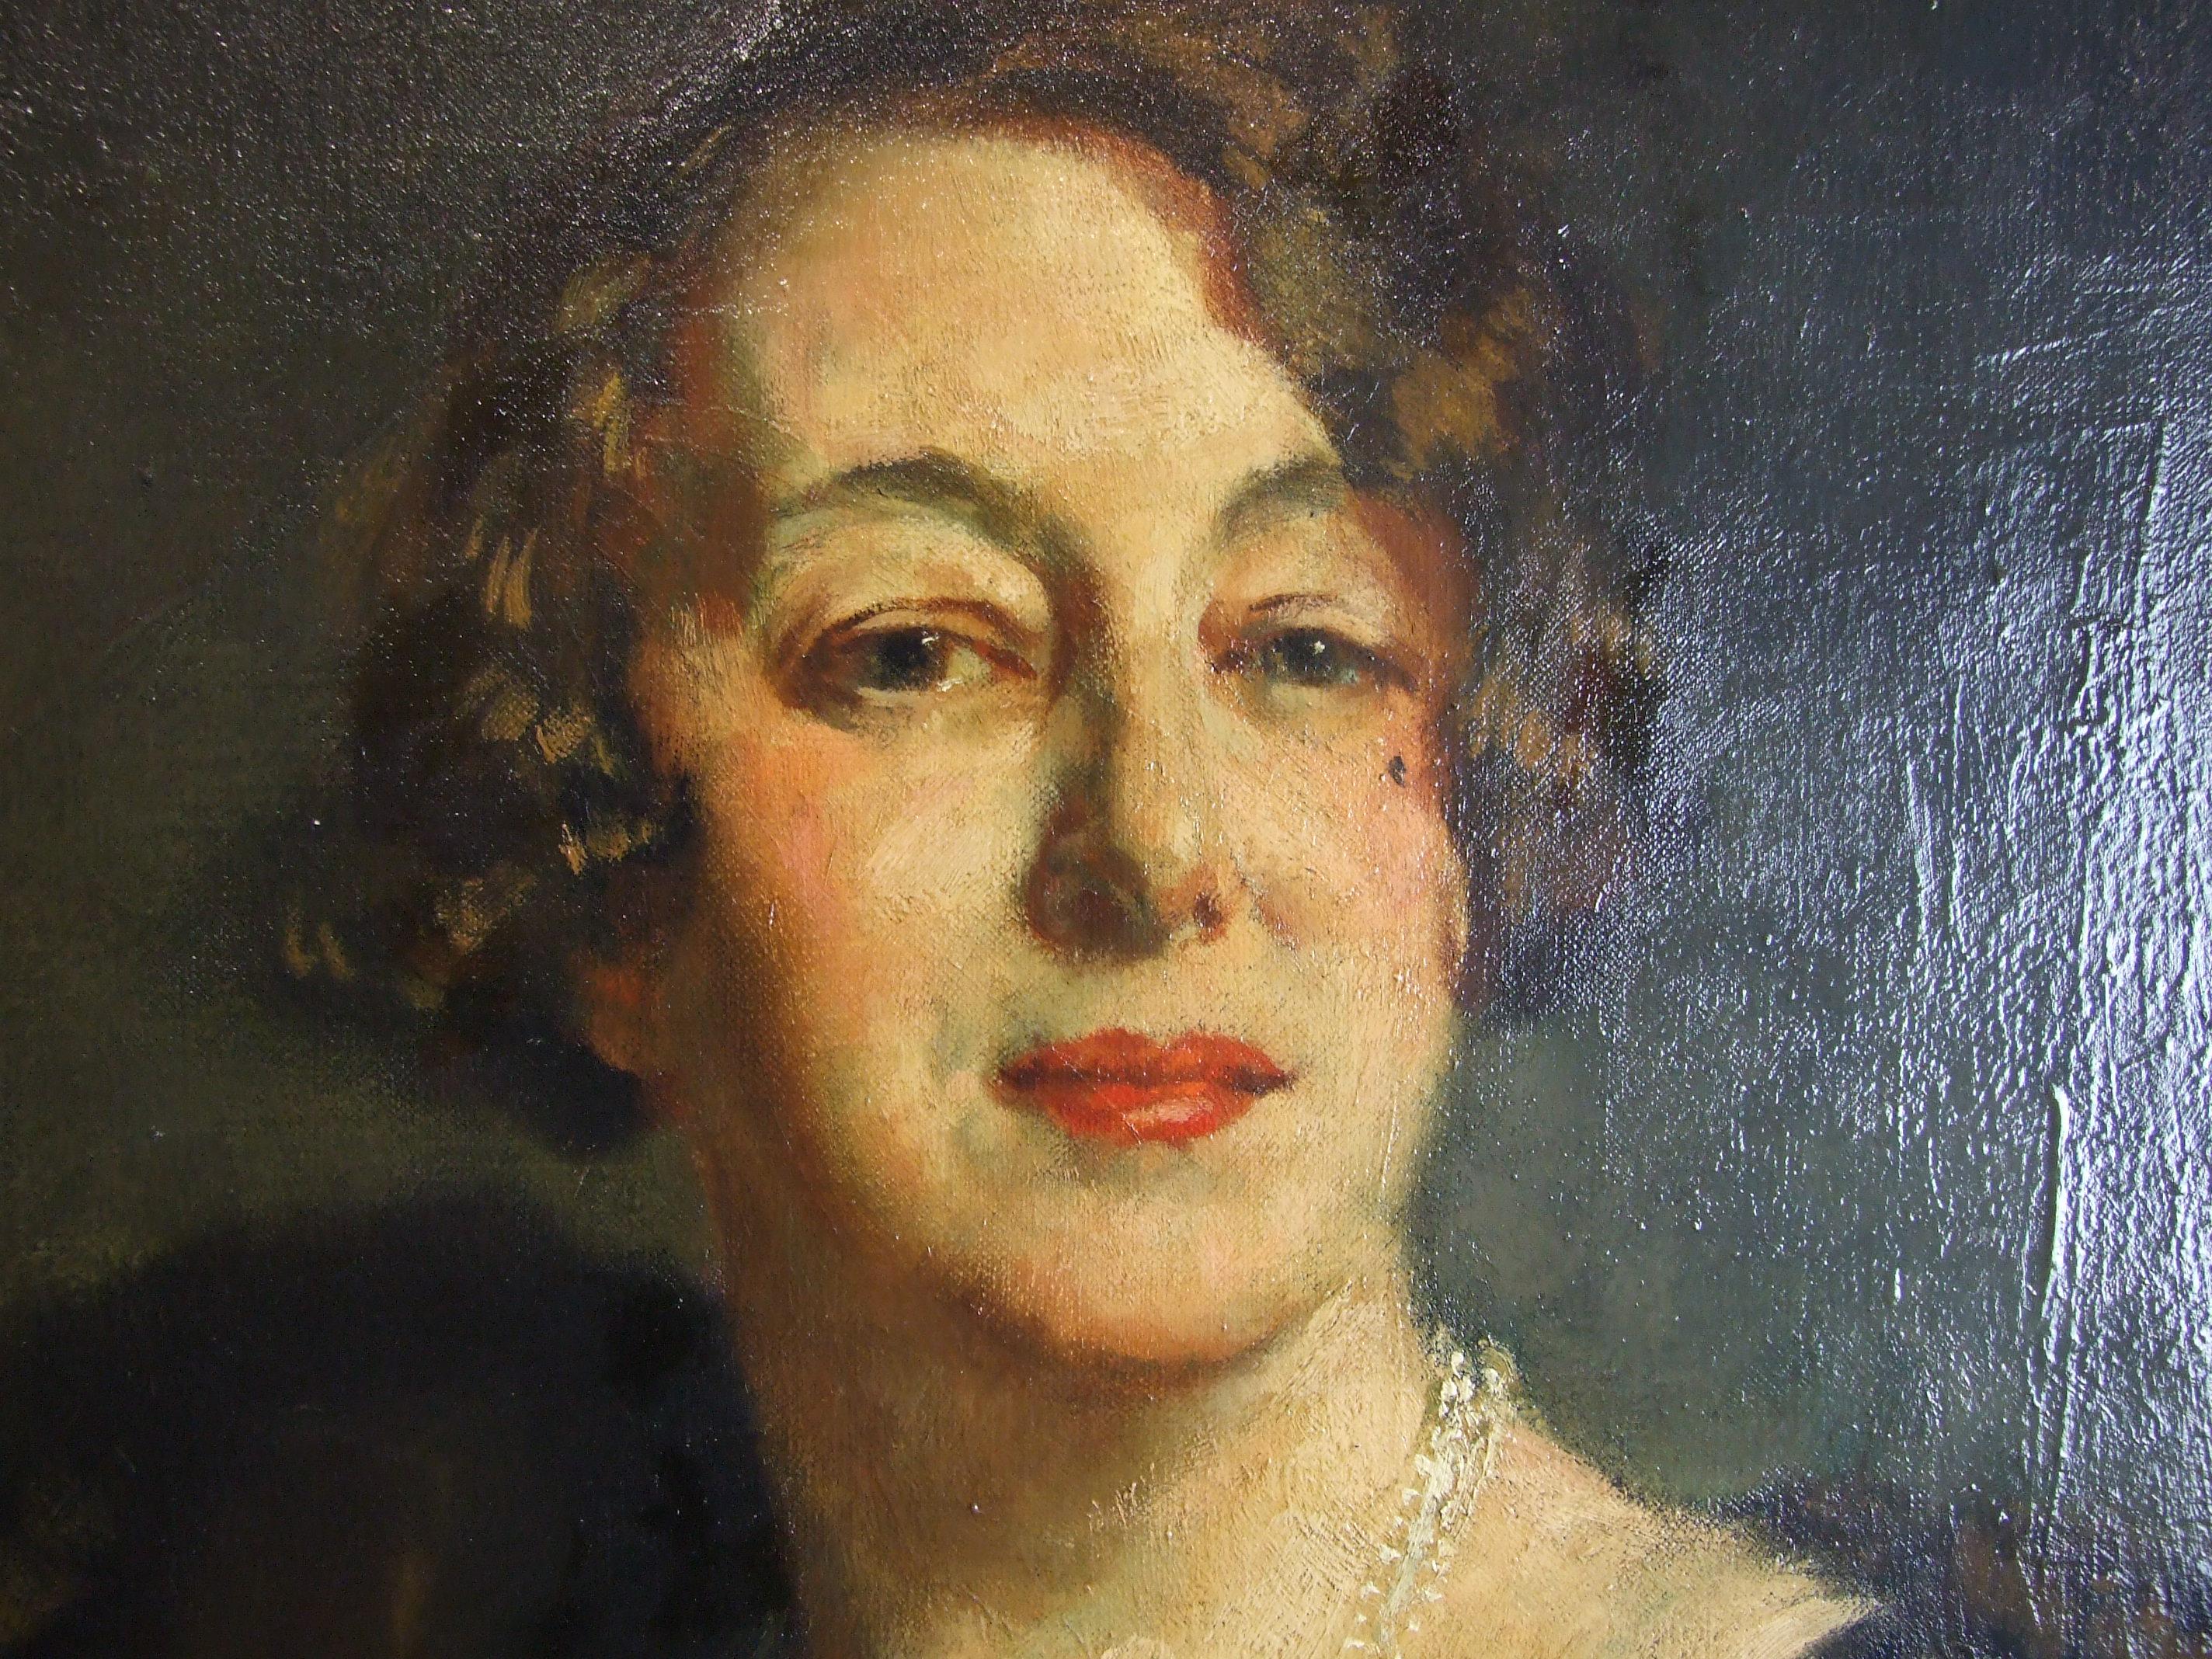 Lot 14 - •Simon Elwes RA (1902 - 1975) ESTHER ROSAMOND MARKE WOOD, CONTESSA SANT'ELIA (1881 - 1965),